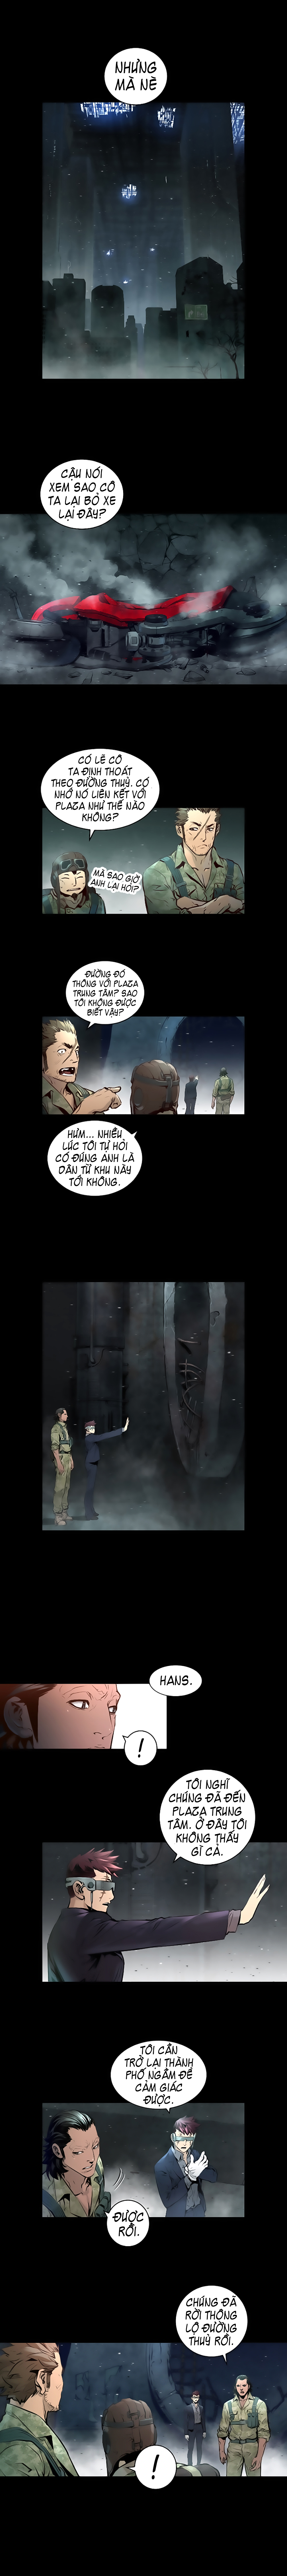 Dị Giới Tam Tuyệt  Chap 48 - Trang 5